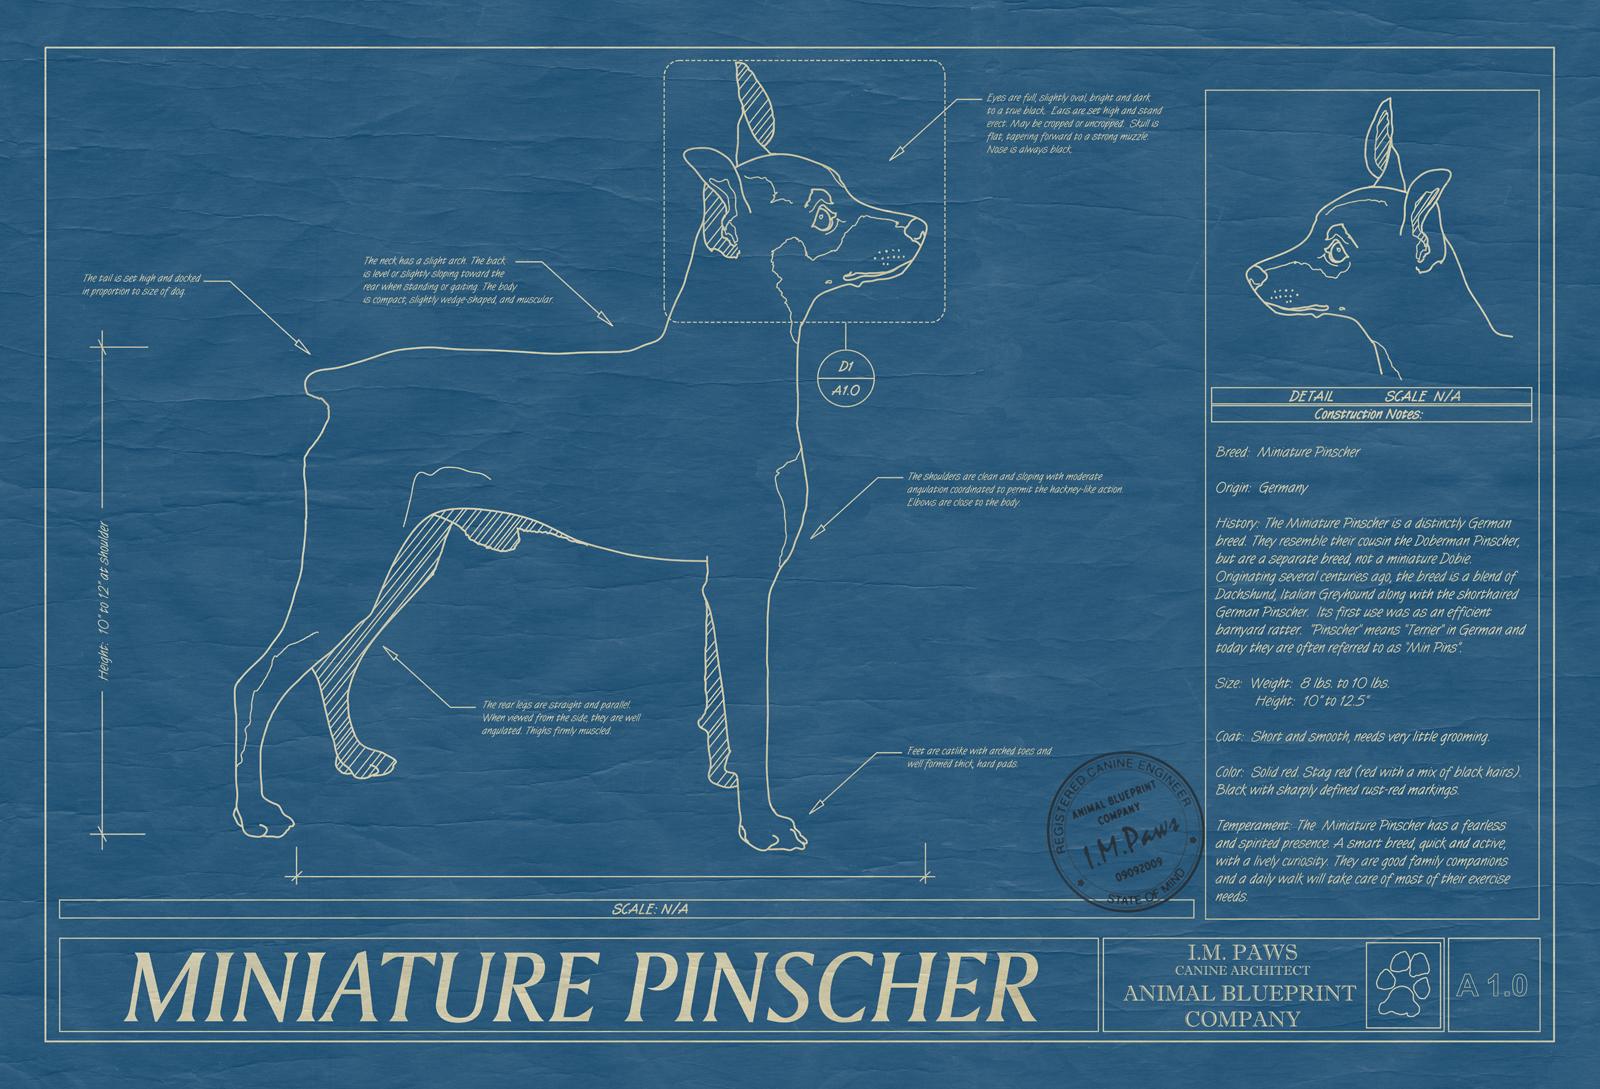 Pinscher miniature animal blueprint company miniature pinscher dog blueprint malvernweather Choice Image